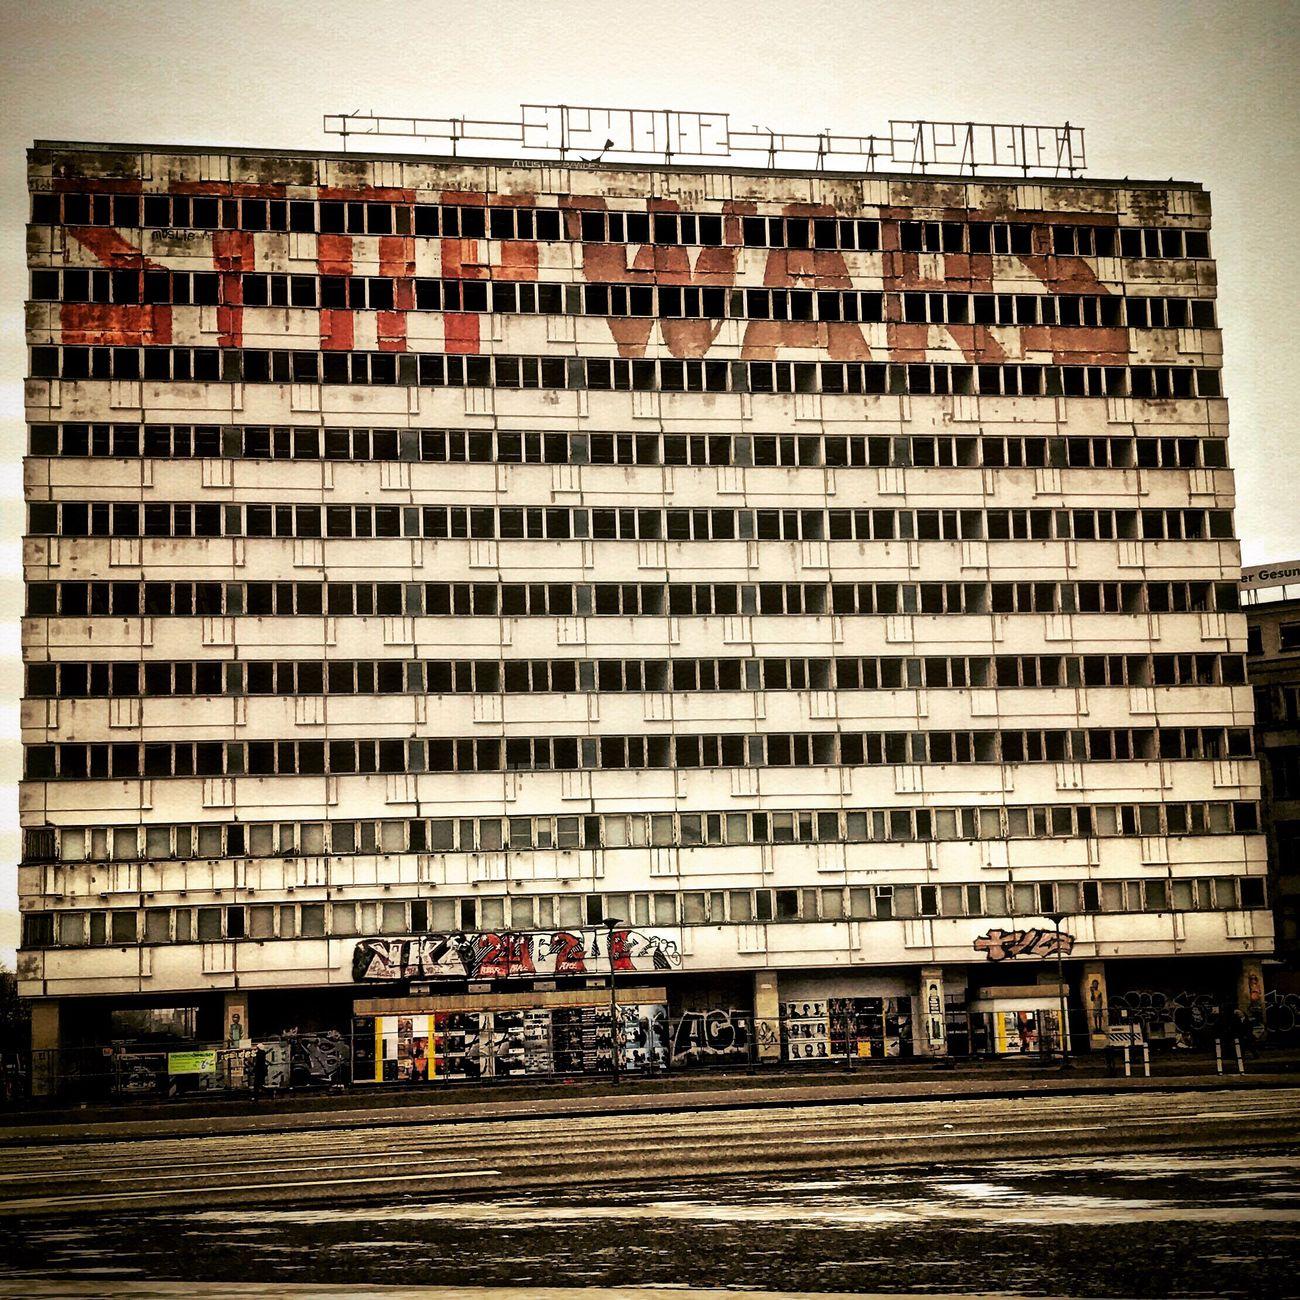 #berlin #nosun #nopeople #building #antifa #2017 #ruine #spruch #cloudy #graffiti